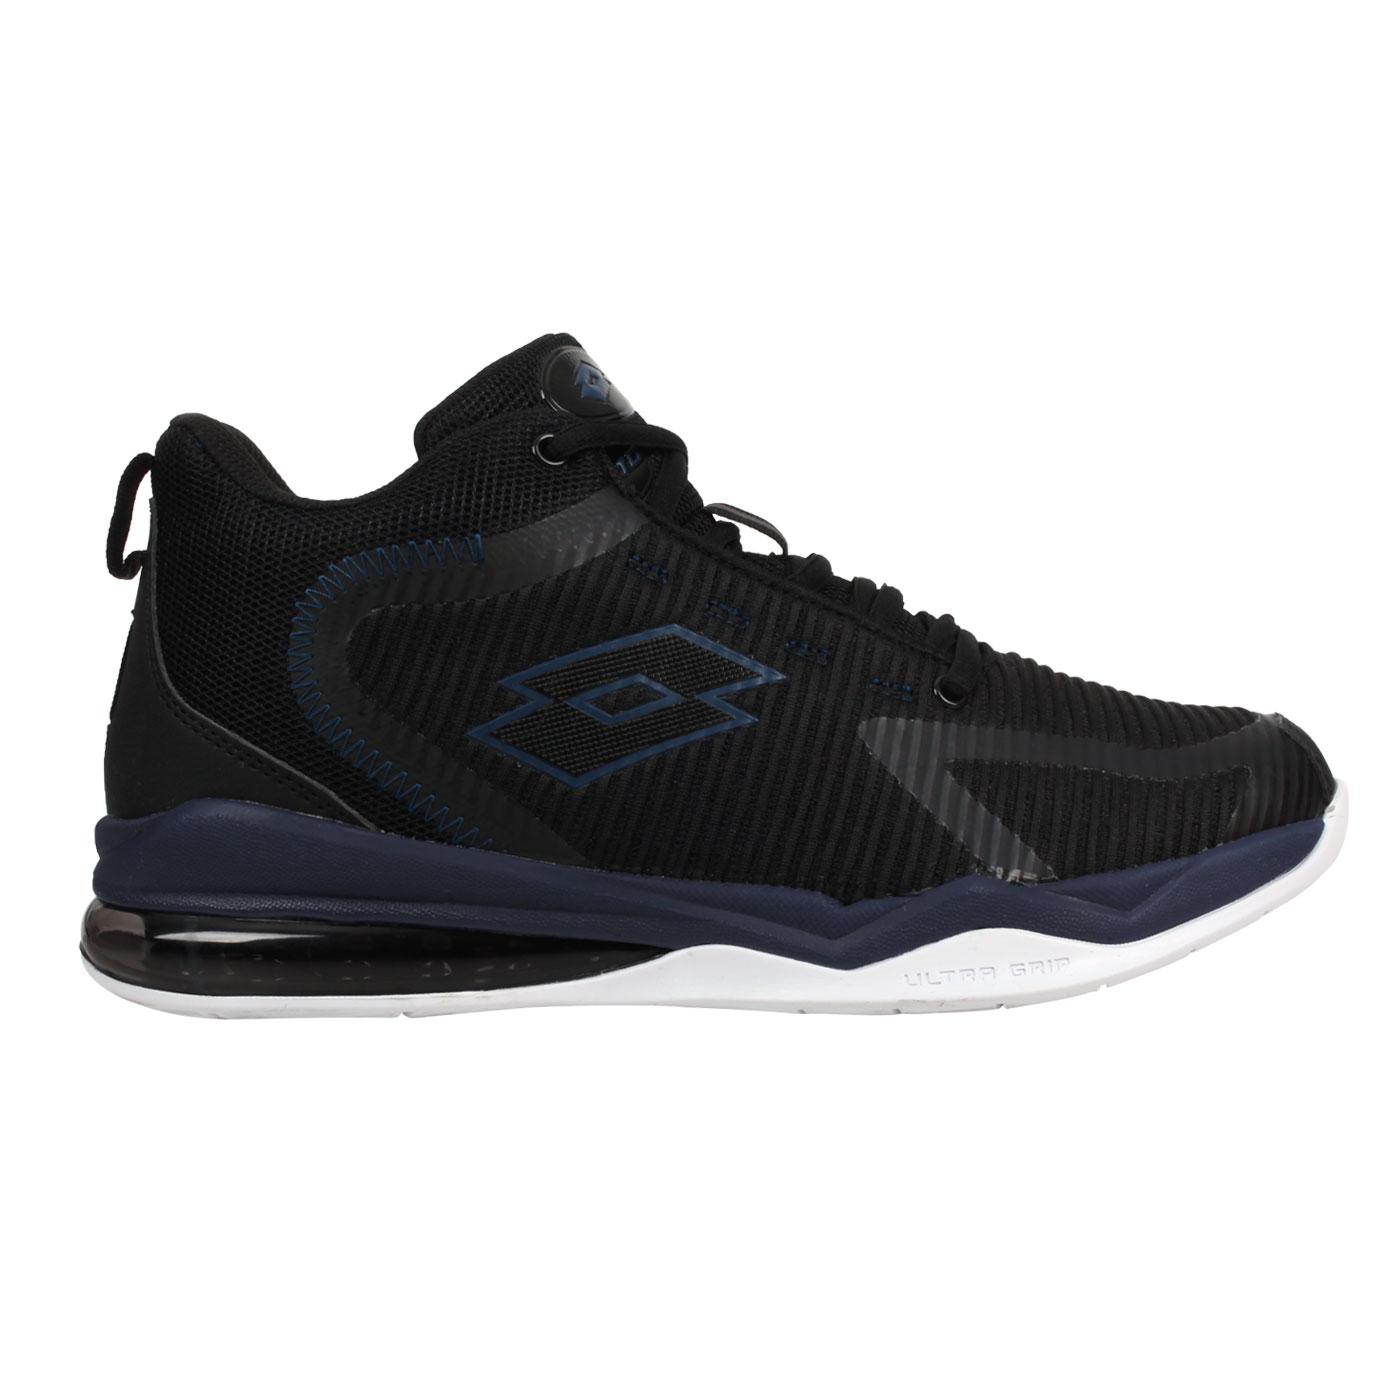 LOTTO 男款氣墊籃球鞋 LT0AMB2730